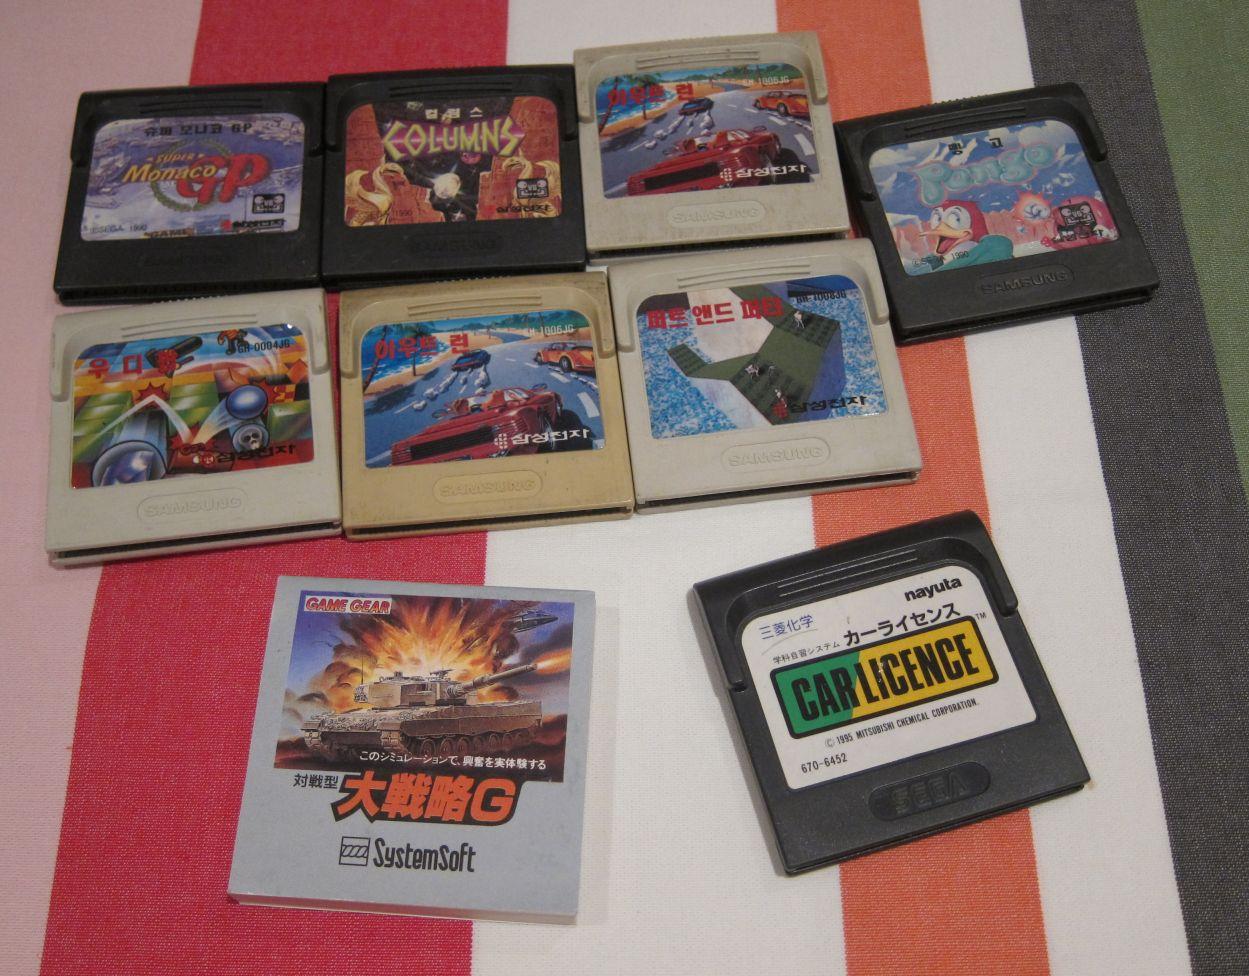 Ma collection Sega 8-bit Korean_gamegear_games_179